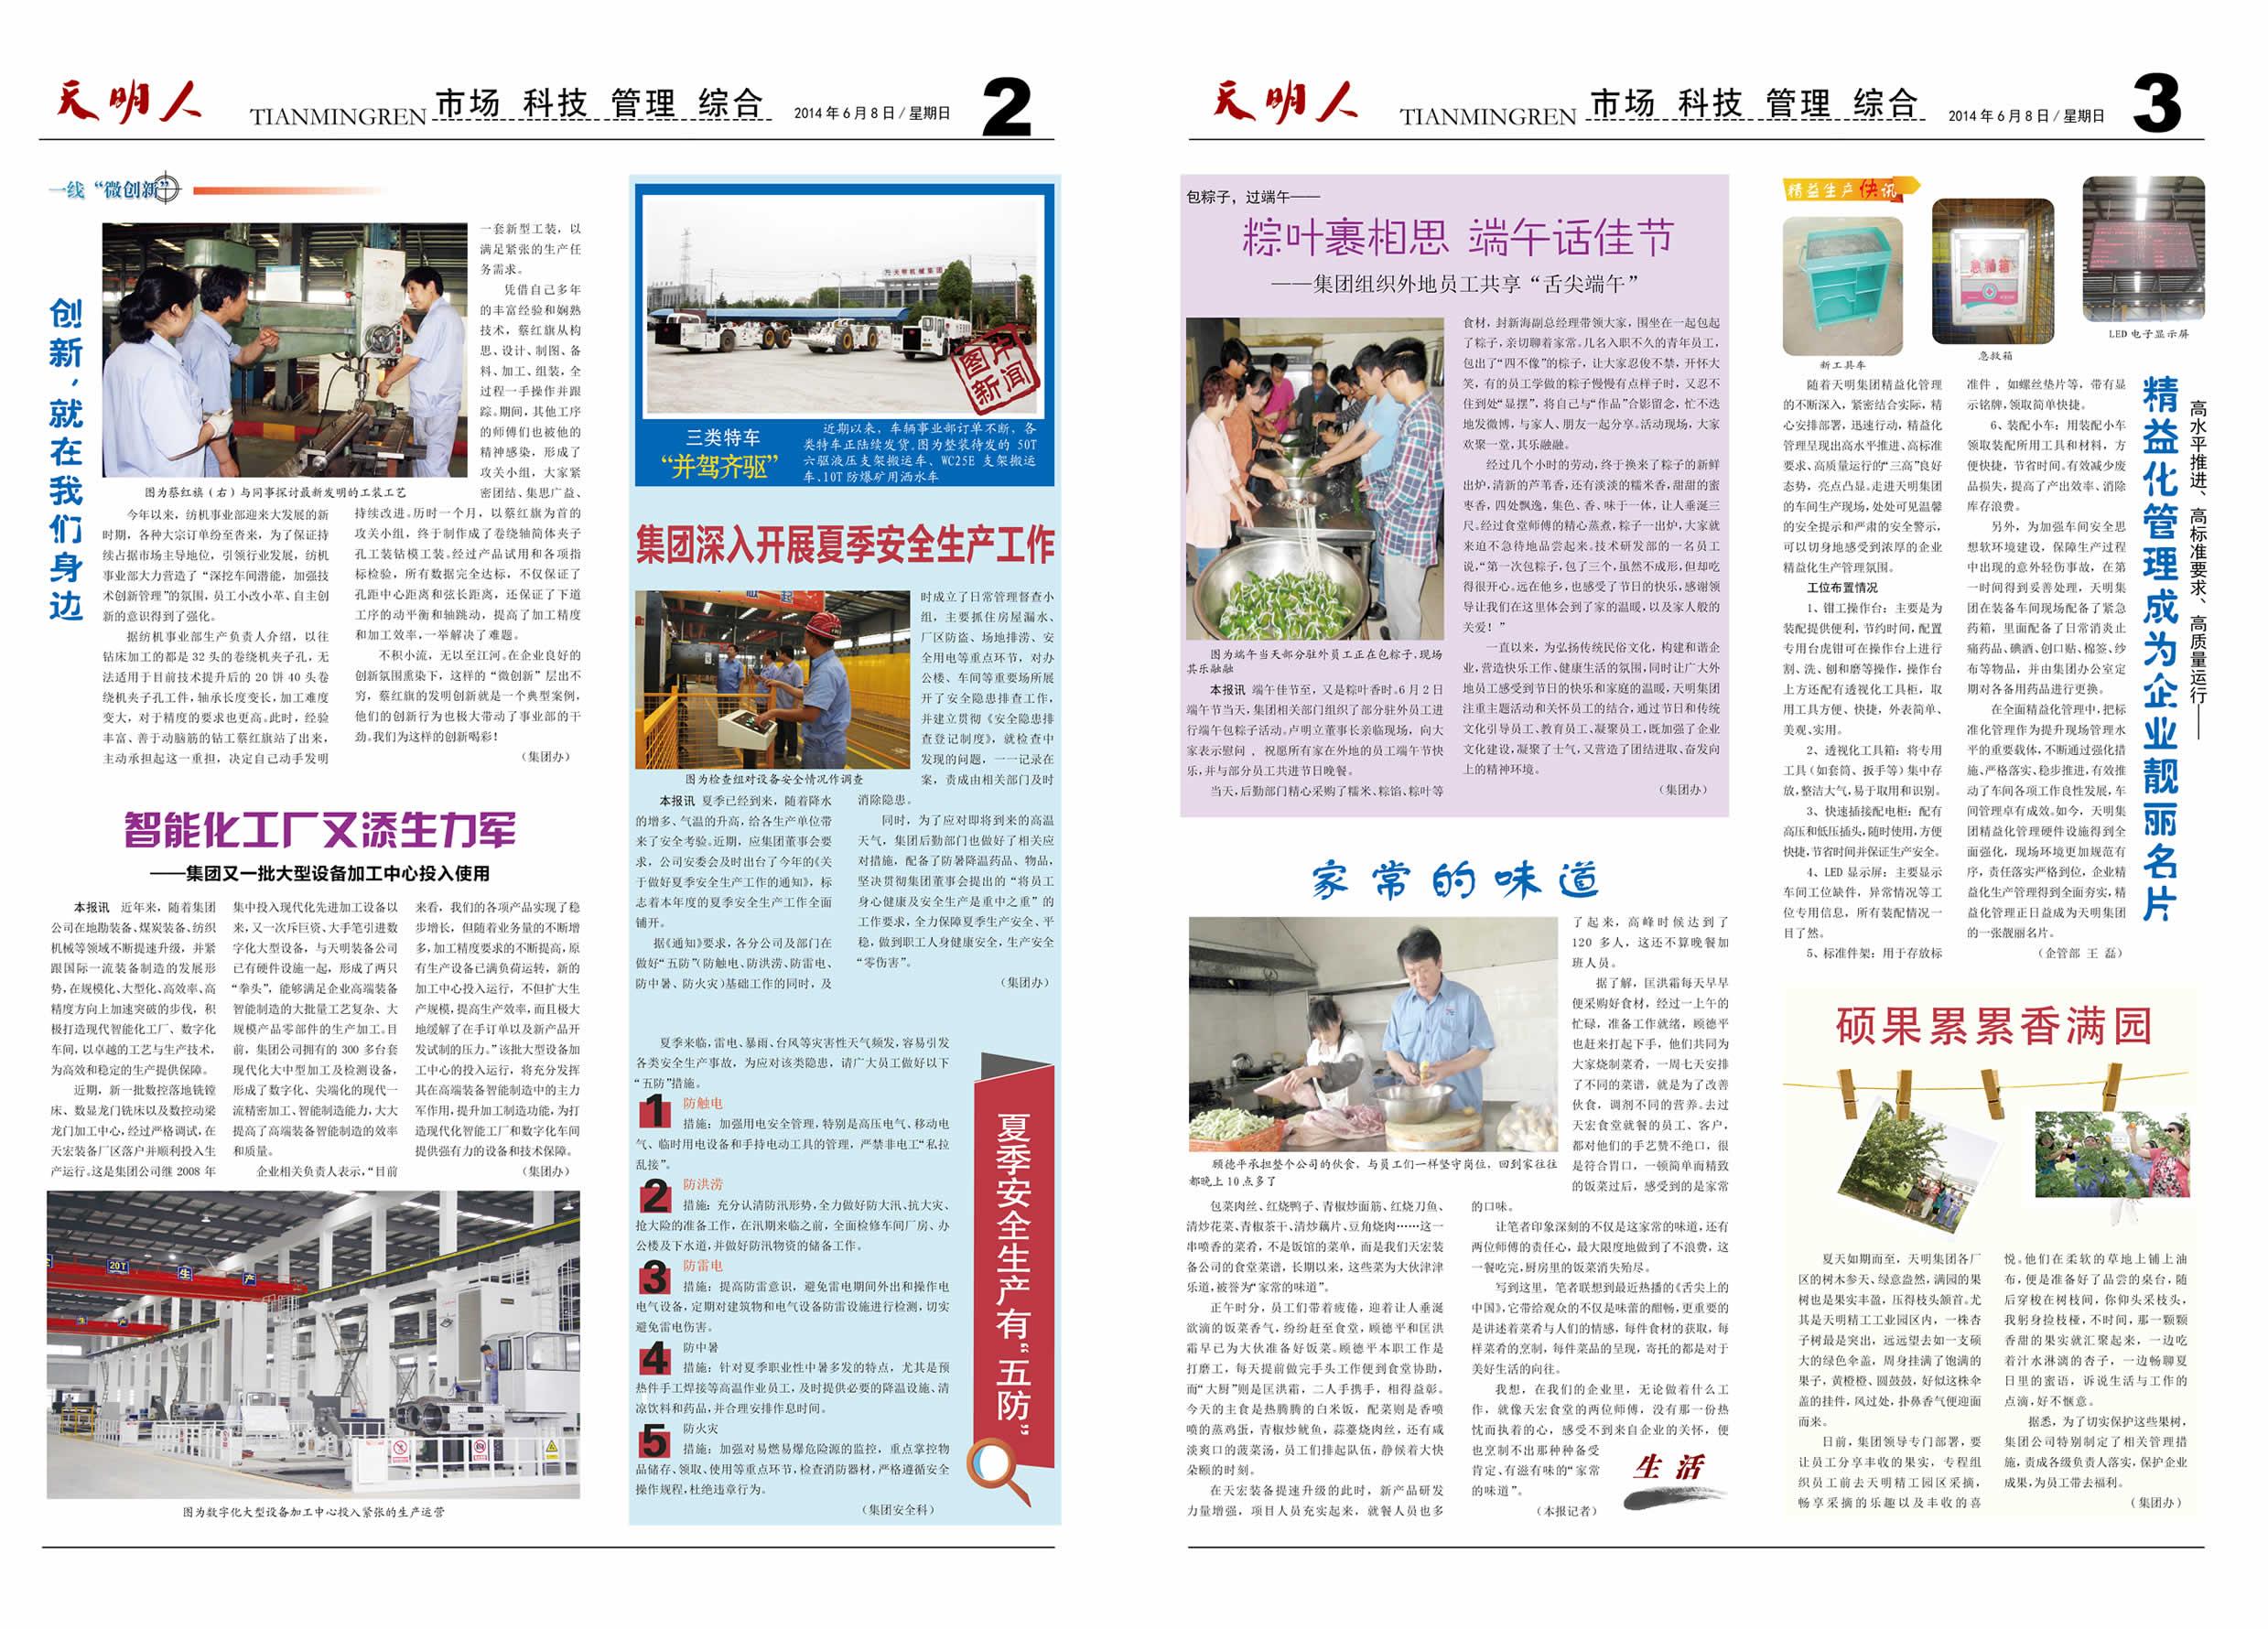 hg711皇冠国际_hg88皇冠国际平台_hg皇冠国际vip首页人2014第06期(总第81期)2、3版